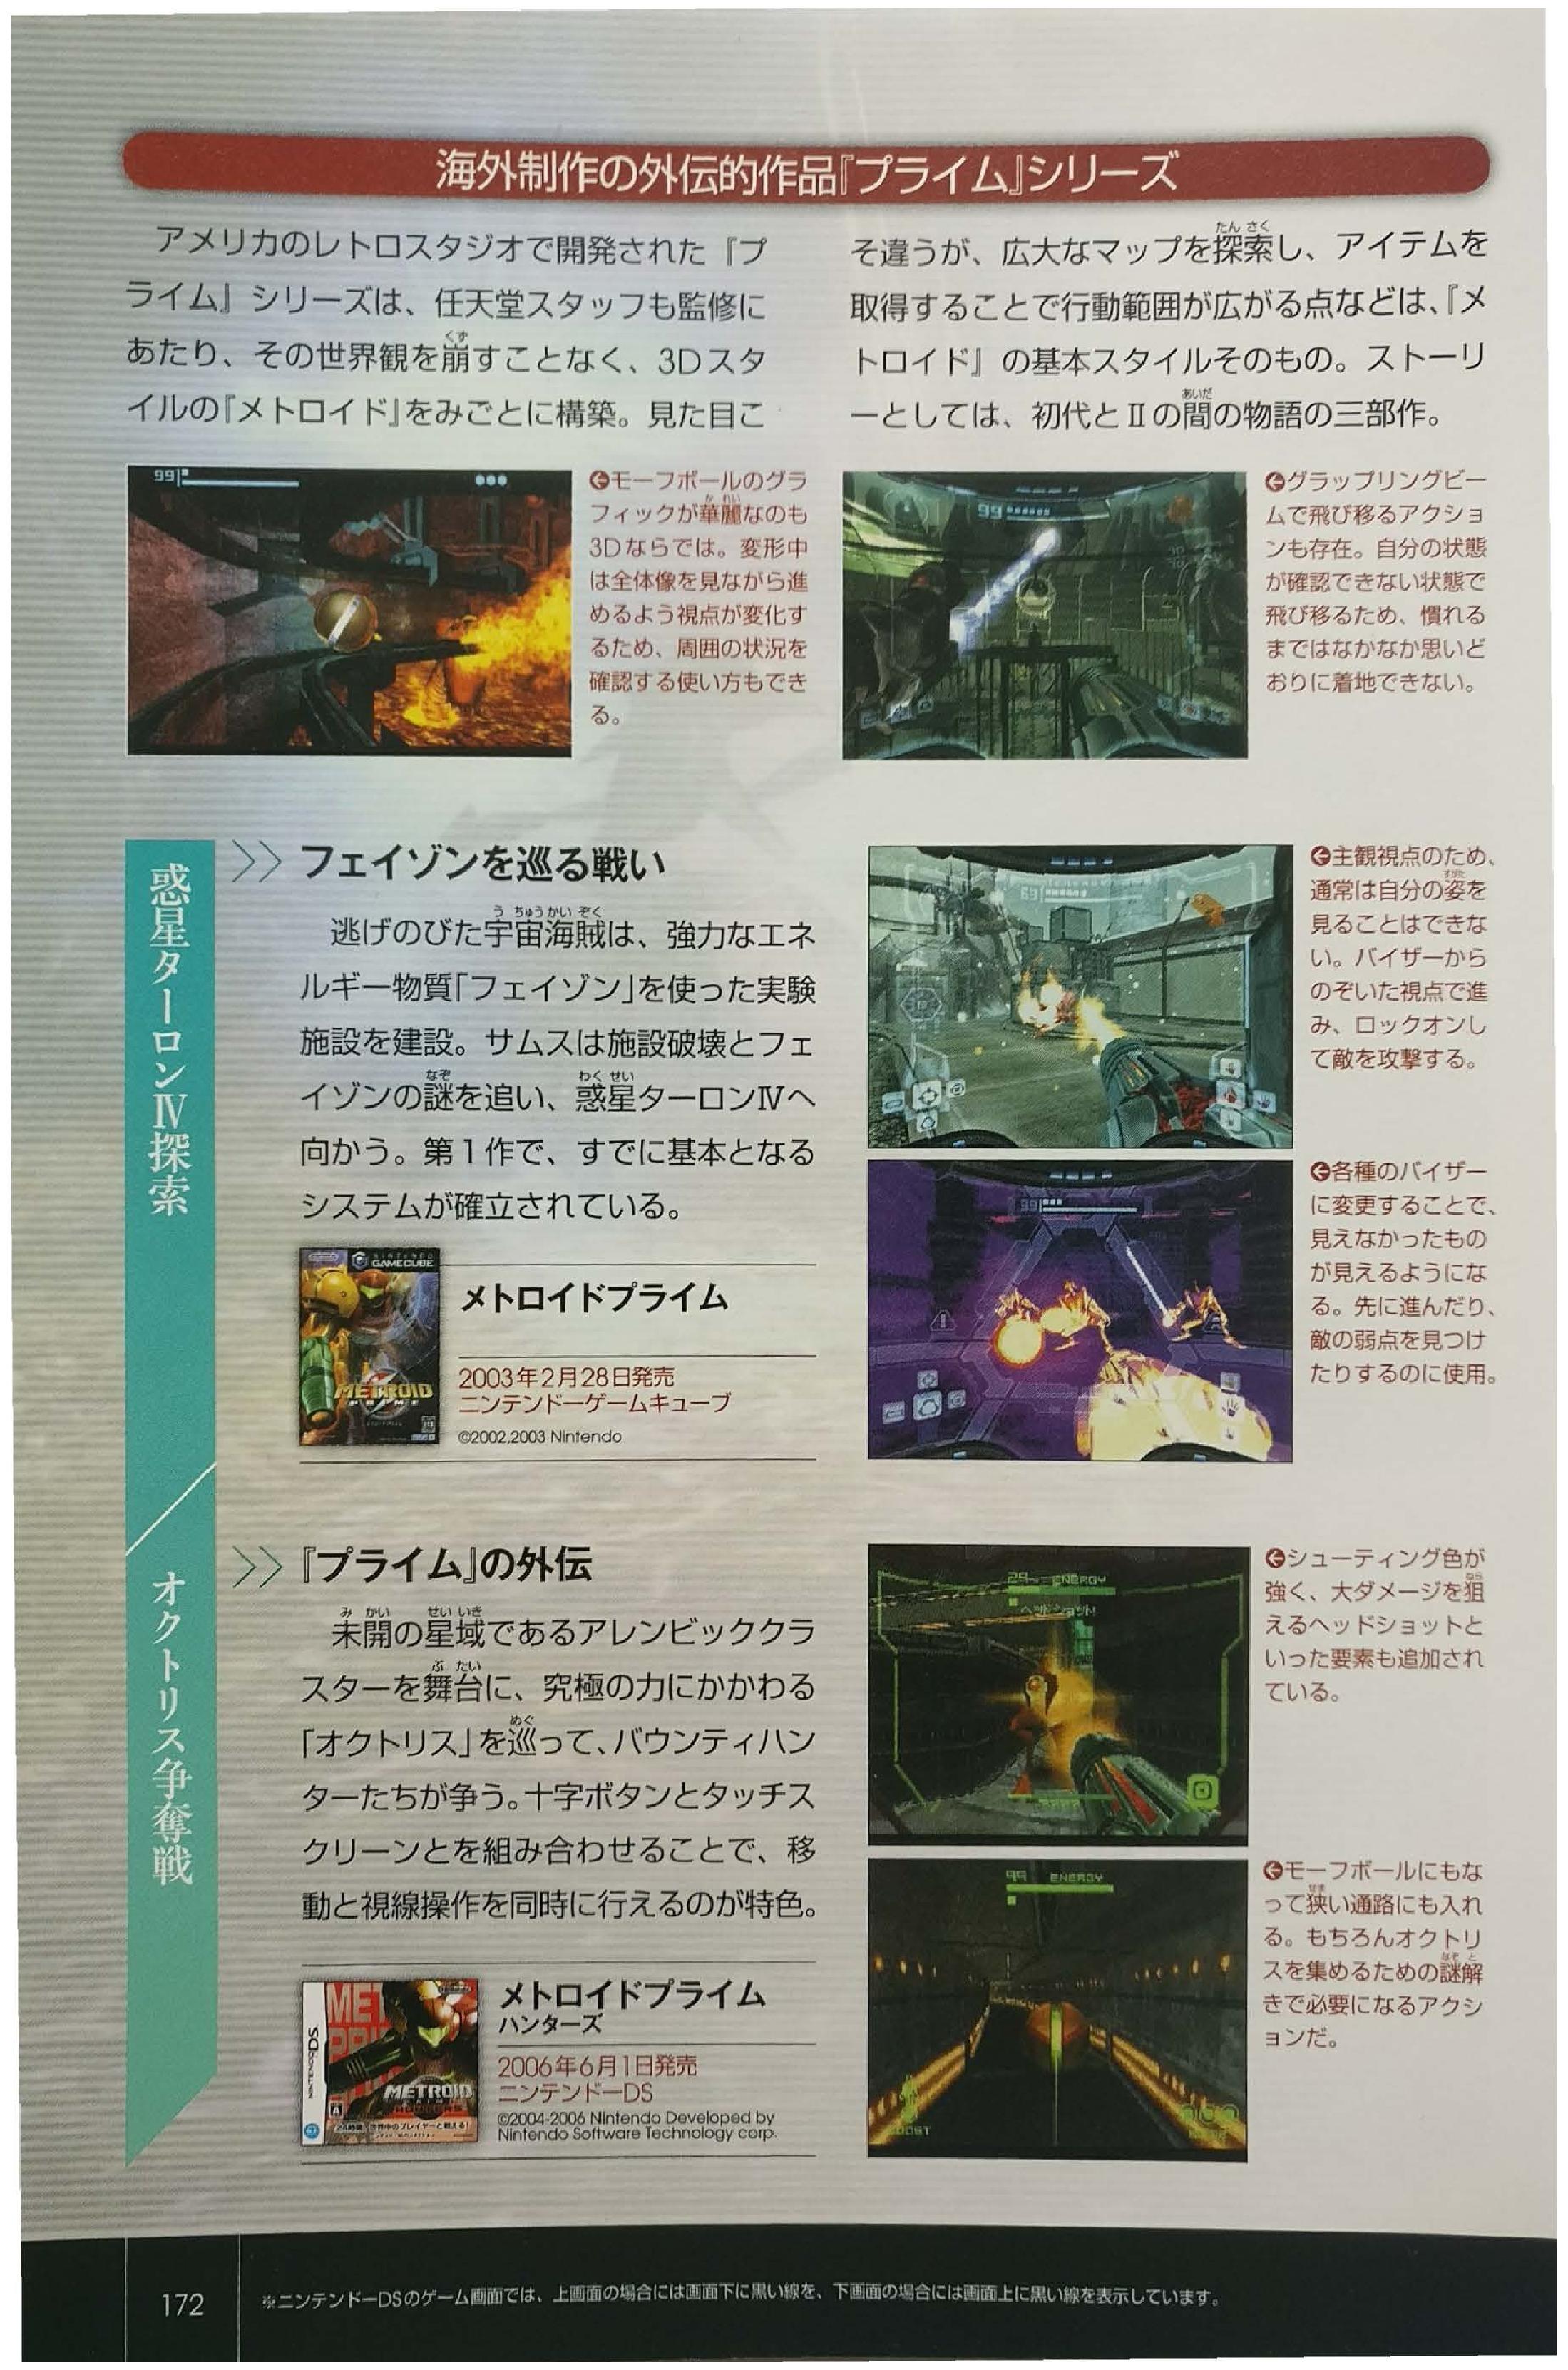 Metroid Prime (game)